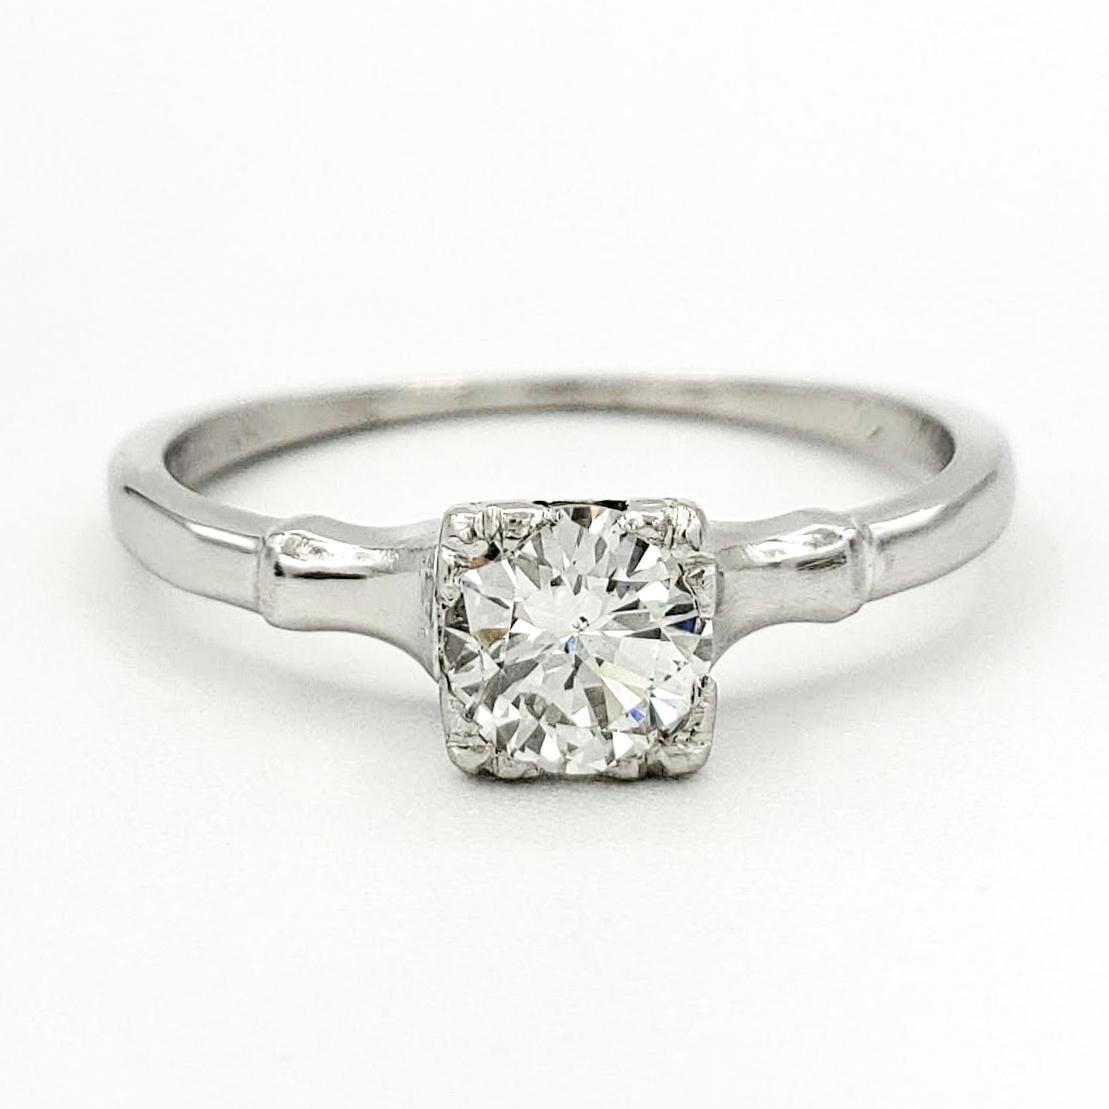 vintage-platinum-engagement-ring-with-0-41-round-brilliant-cut-diamond-egl-g-si1